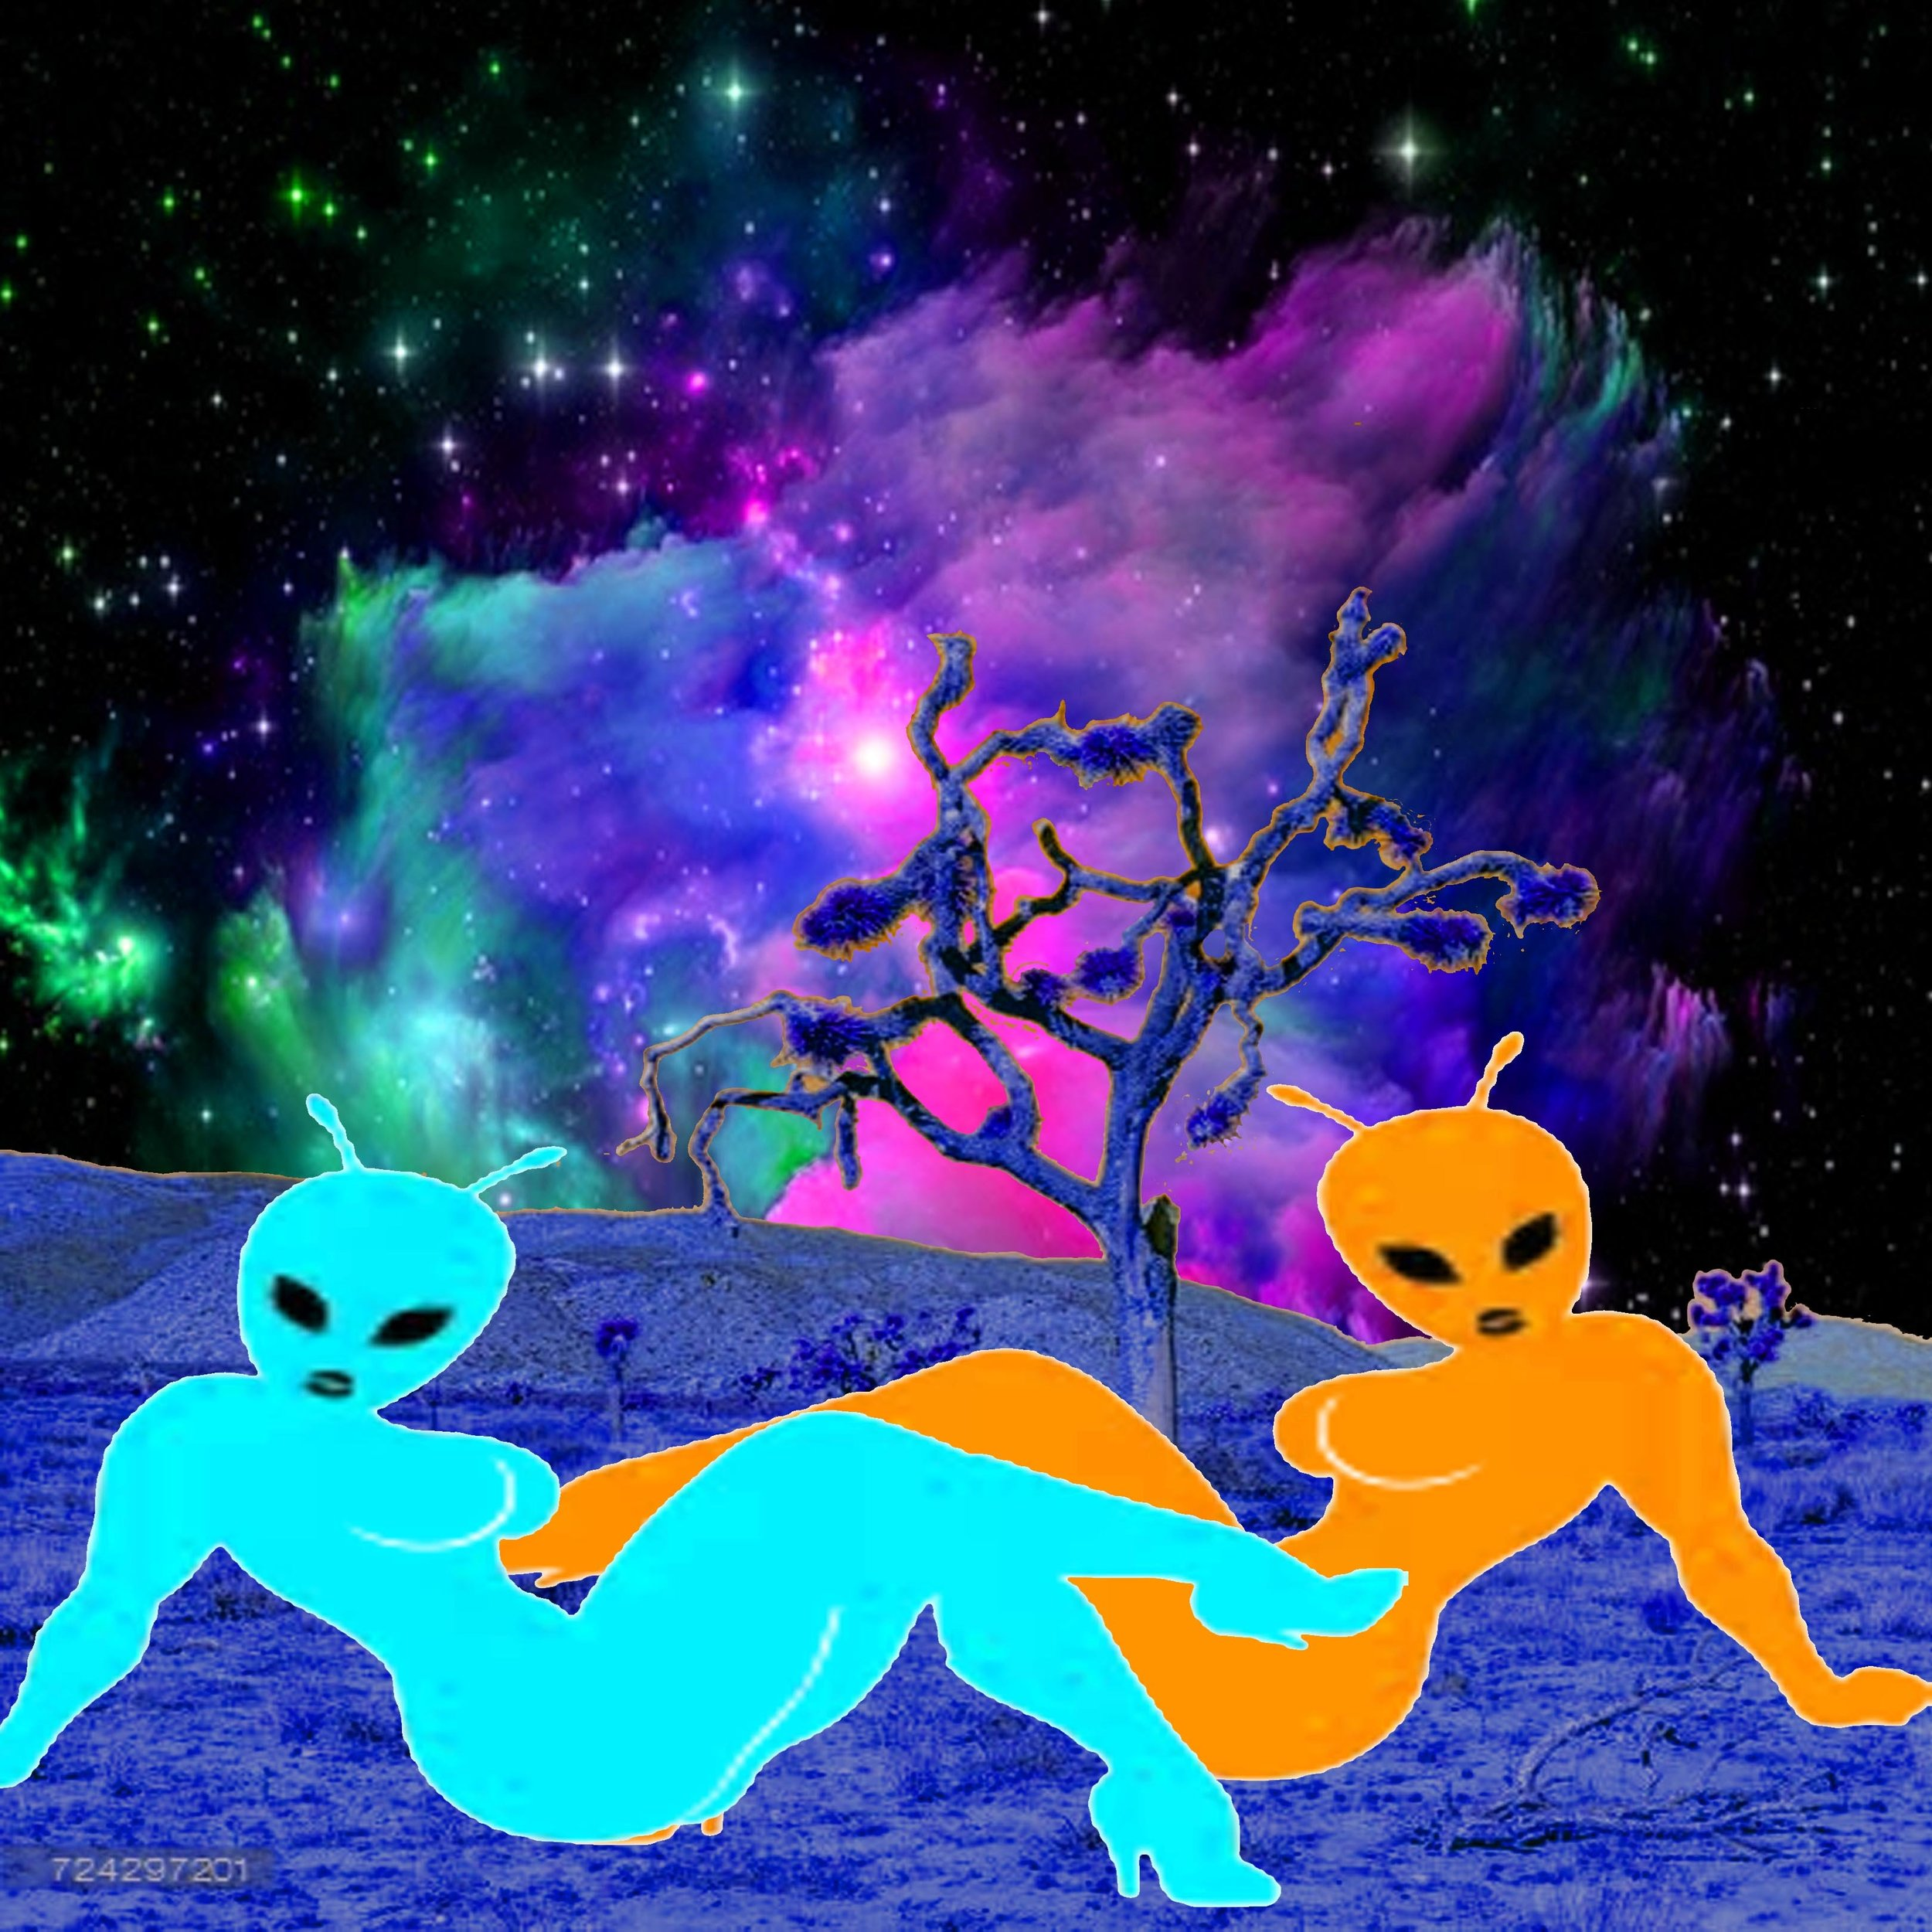 alienssexy.jpg